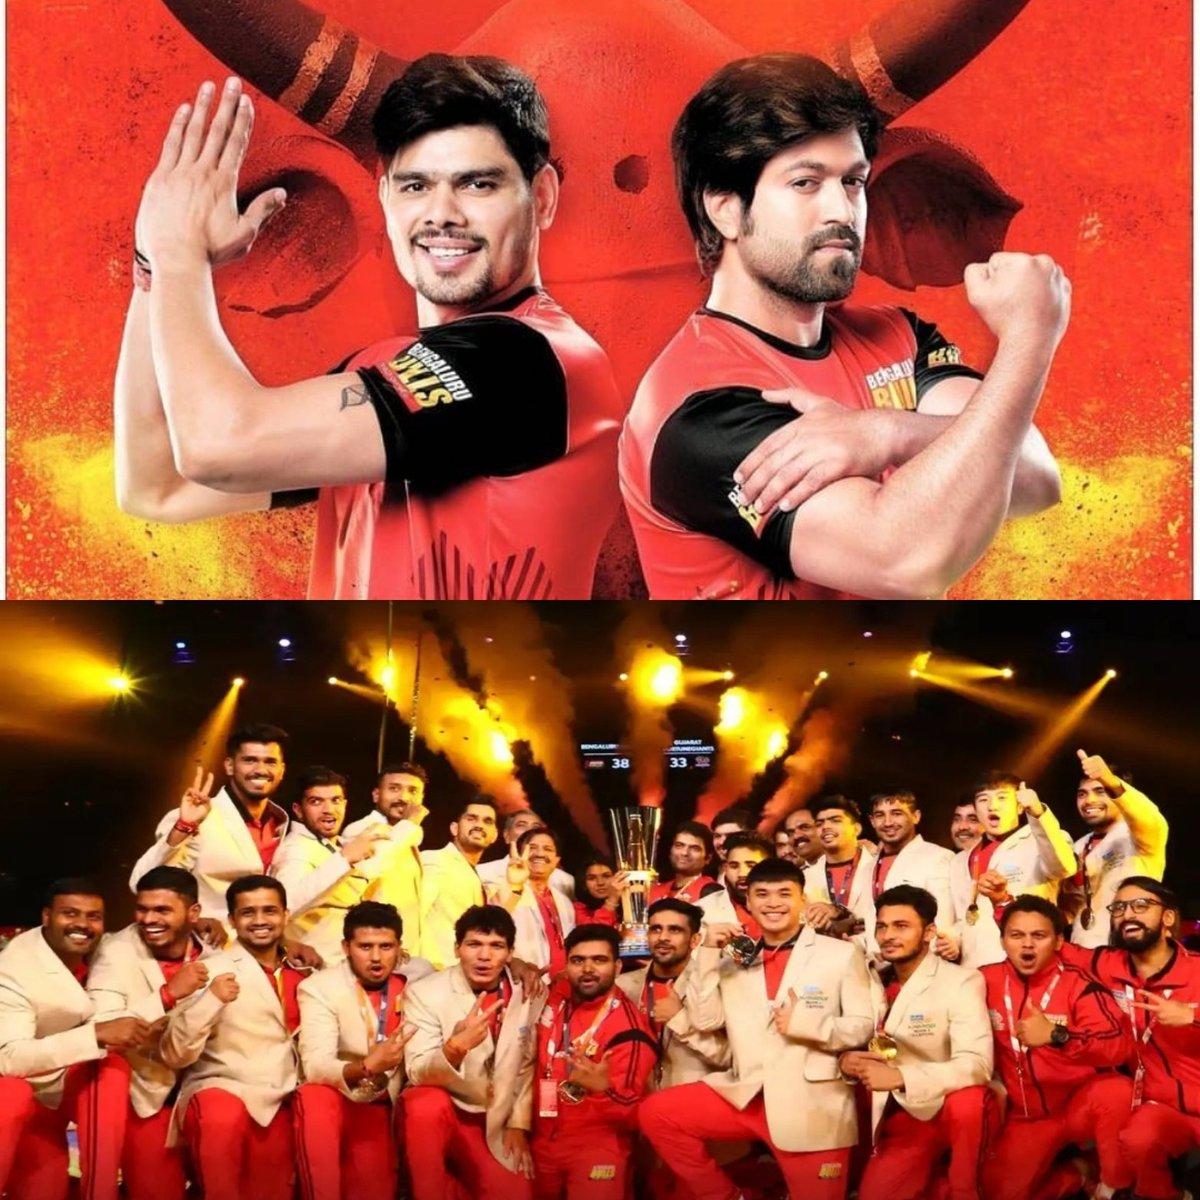 Congratulations on the incredible win @BengaluruBulls in the #ProKabaddiFinal! Very proud of namma Bengaluru Bulls Team. Special mention to Pawan Sehrawat for a great performance.  Ee salaa cup Namde 🏆😊 @ProKabaddi